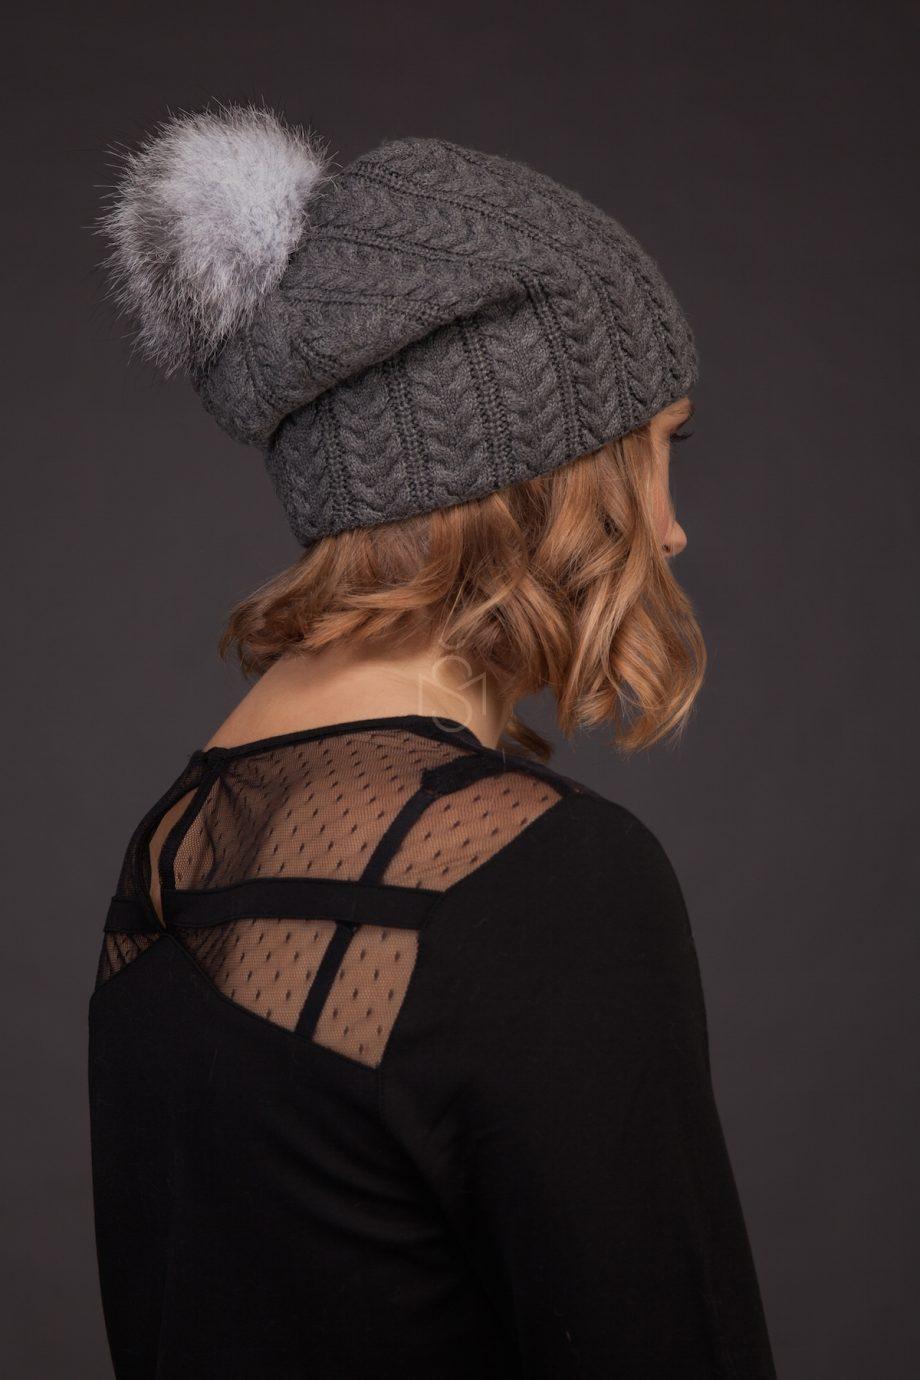 Cashmere hat with fox fur pom-pom_dark_gray_made by SILTA MADA fur studio in Vilnius